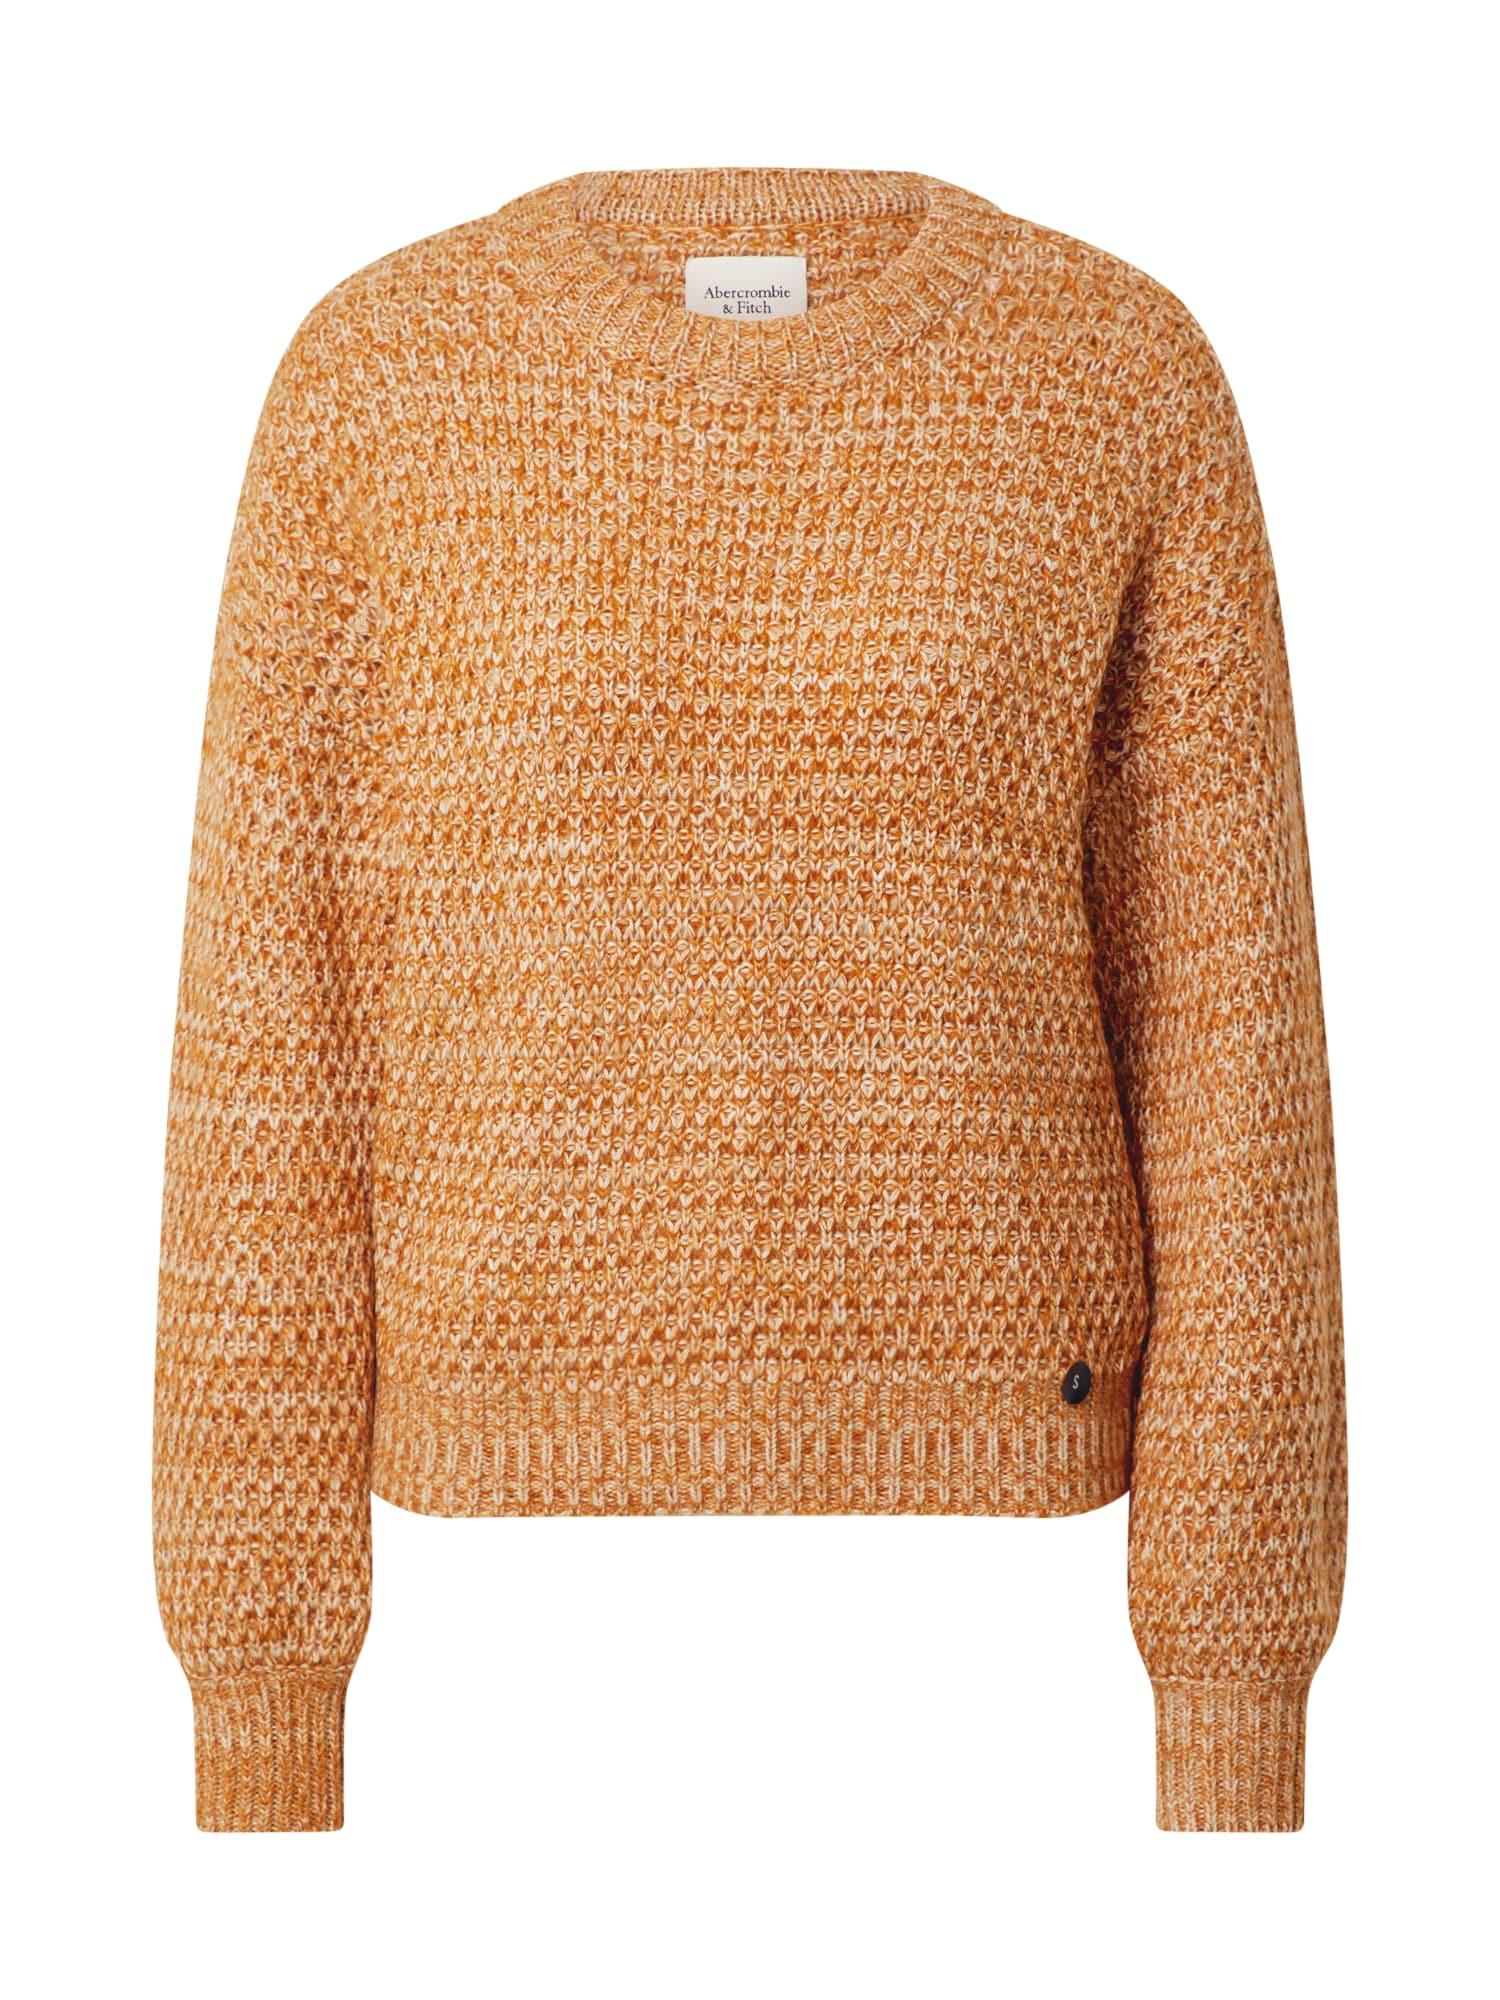 Abercrombie & Fitch Megztinis margai oranžinė